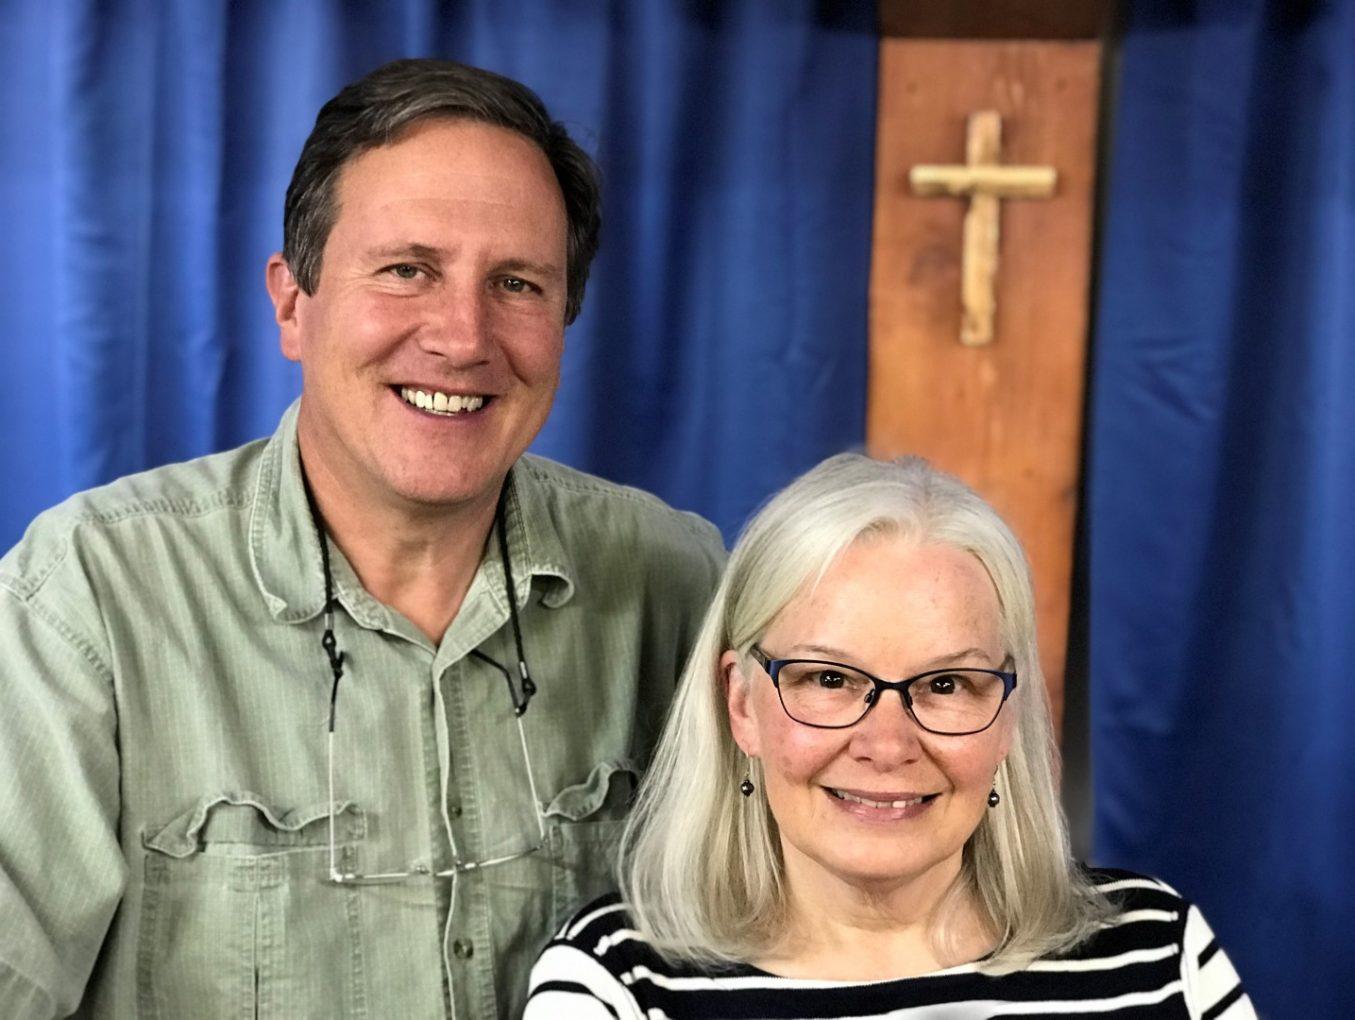 Texas Sunday Service 2019-03-31